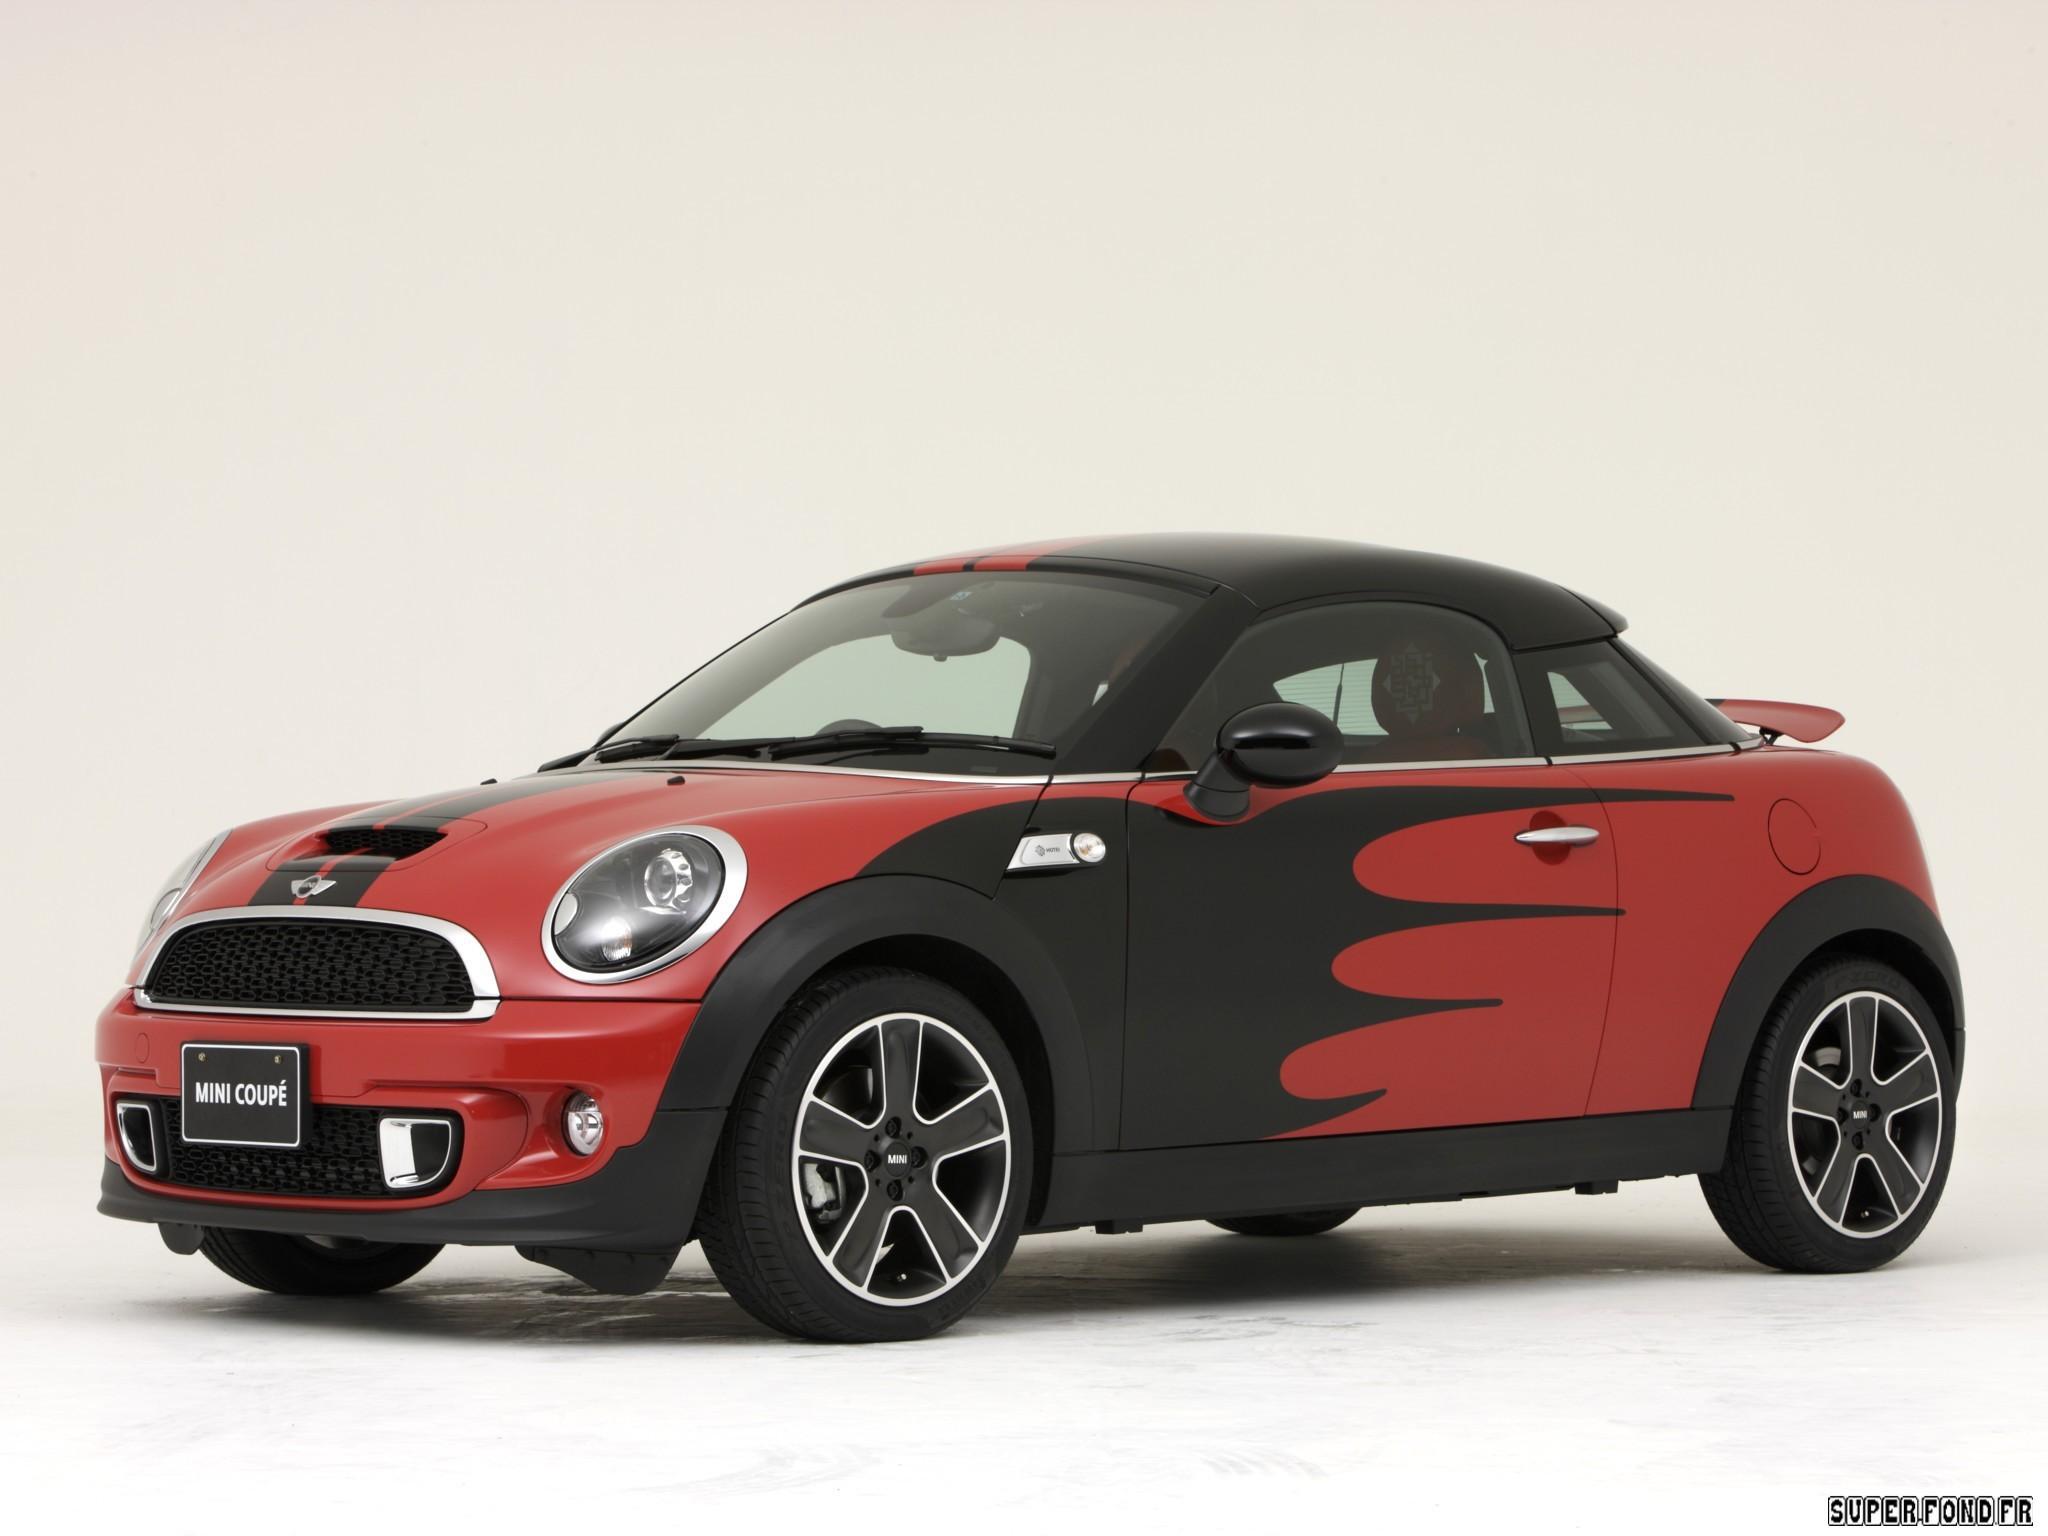 2012 Mini Cooper S Coupe Hotei